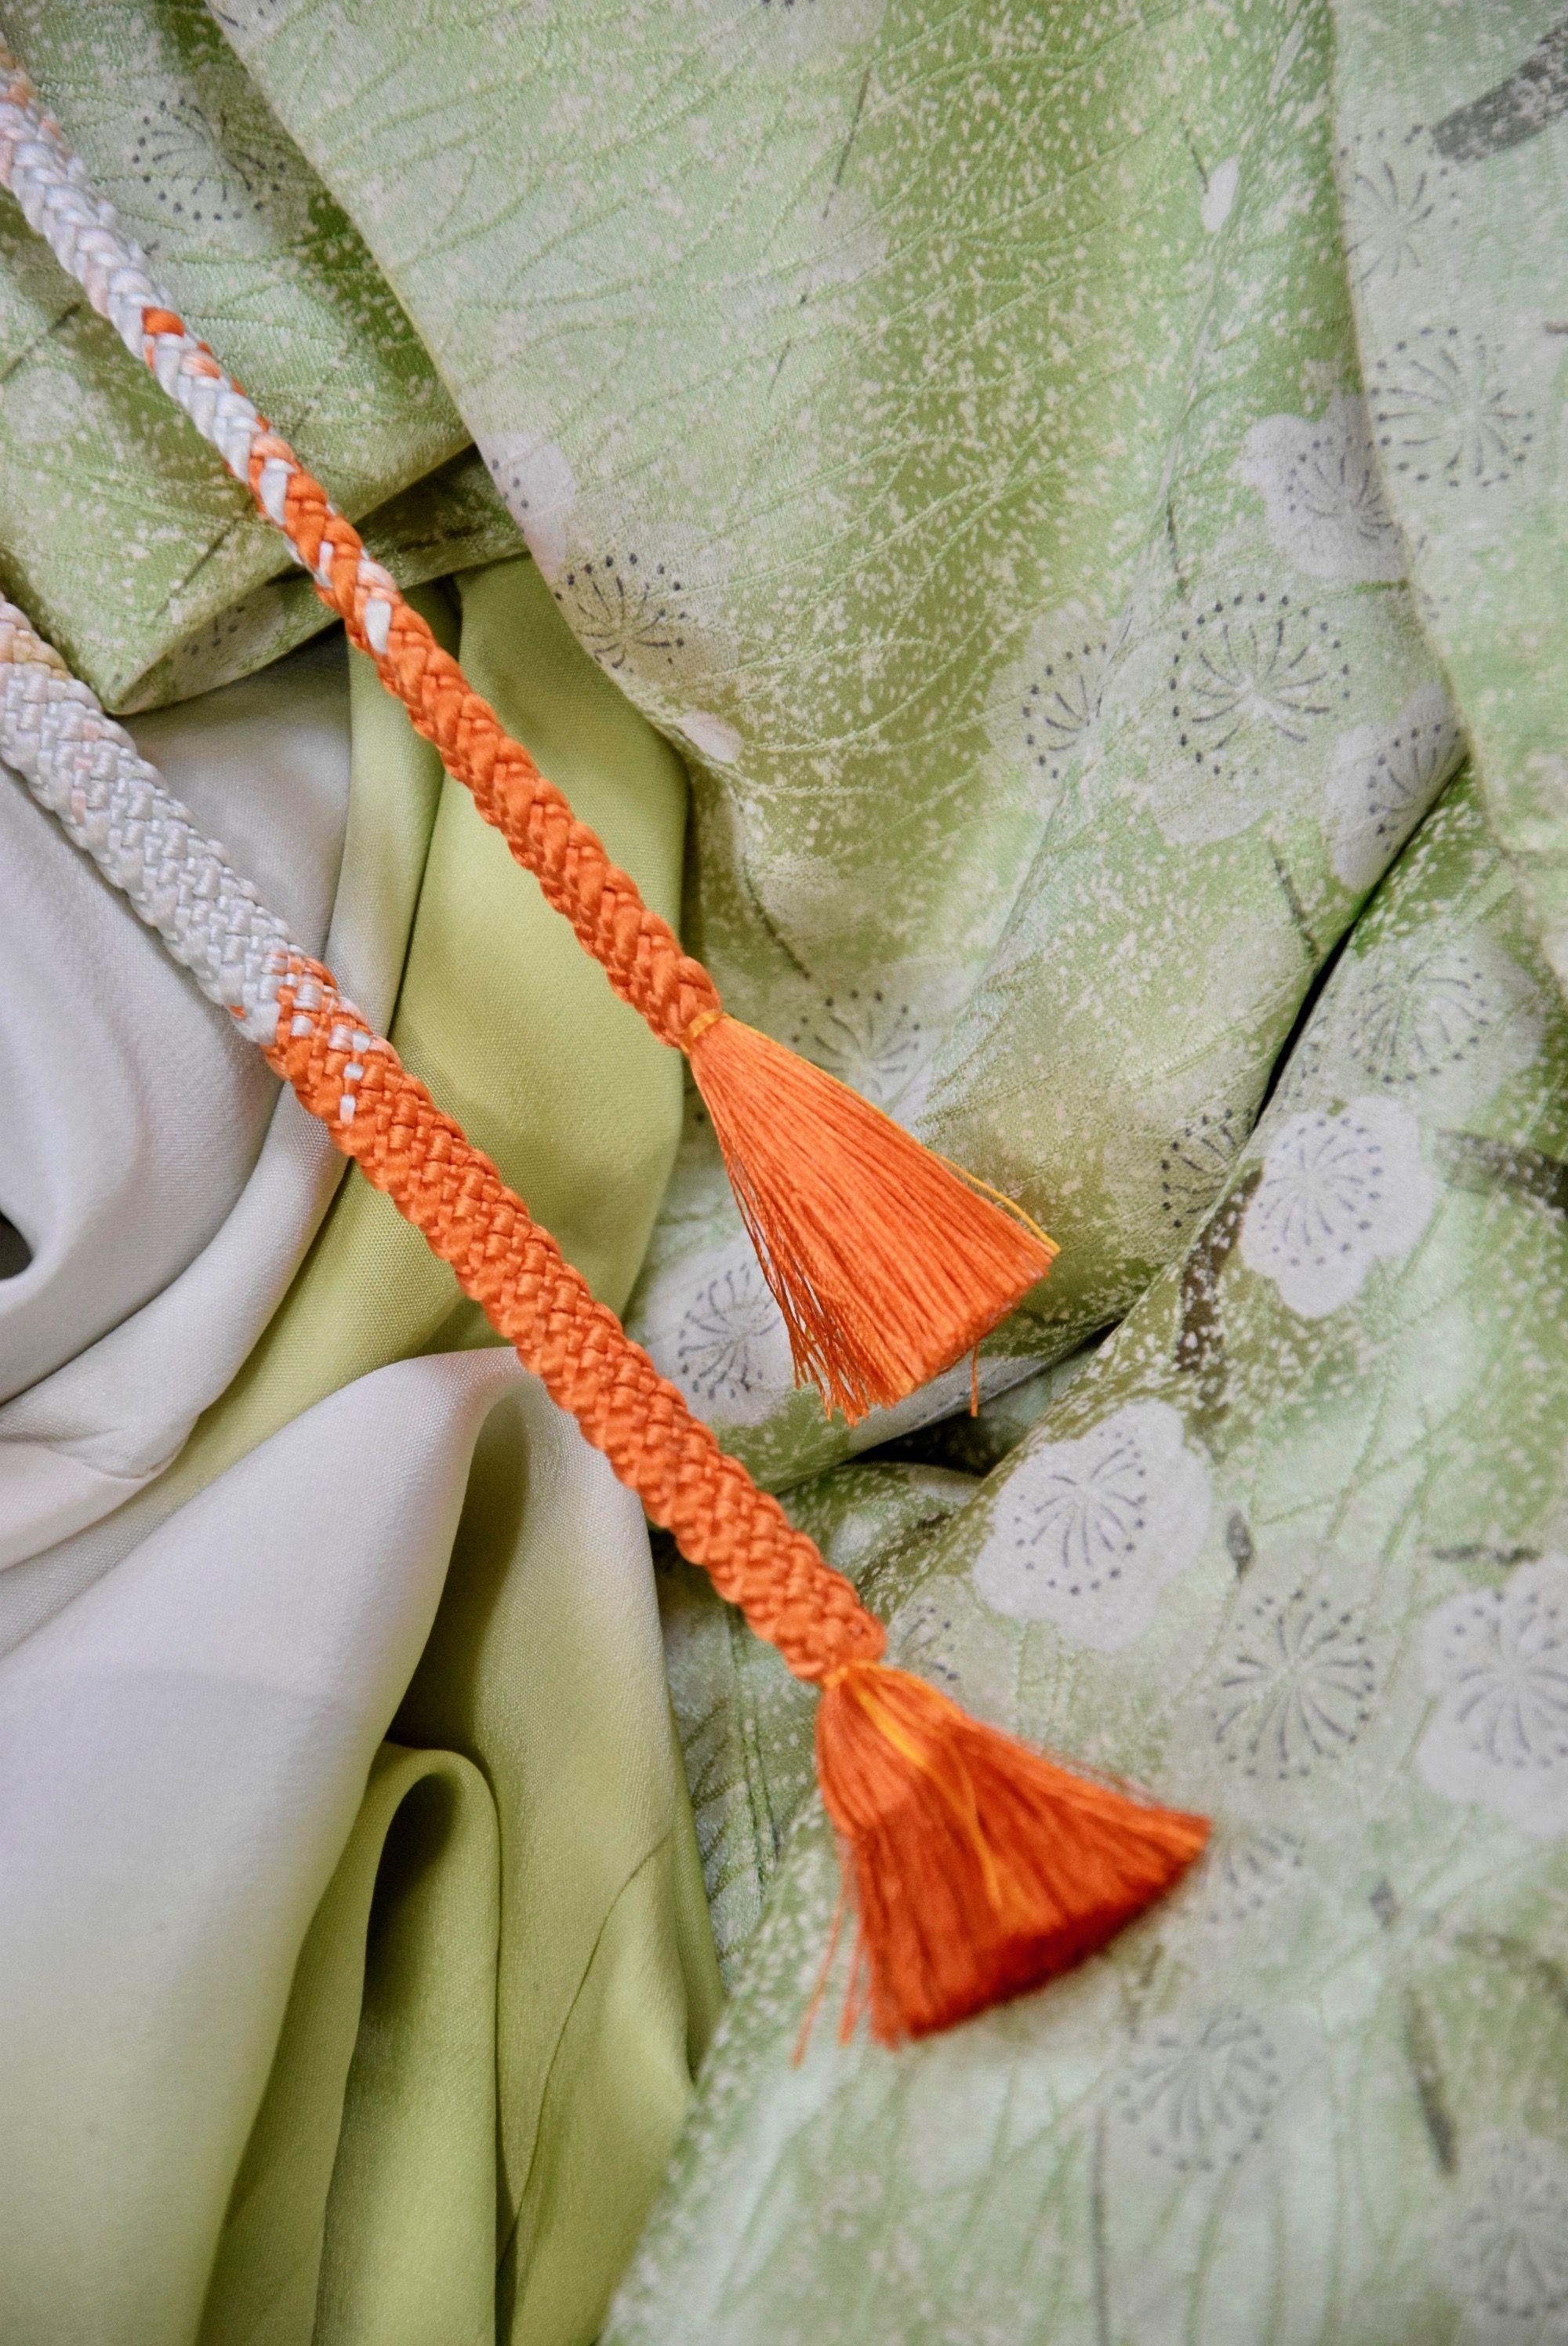 Seiden Kimono Aus Lindgruner Seide Mit Umebluten Etsy Japanese Fabric Vintage Kimono Fabric